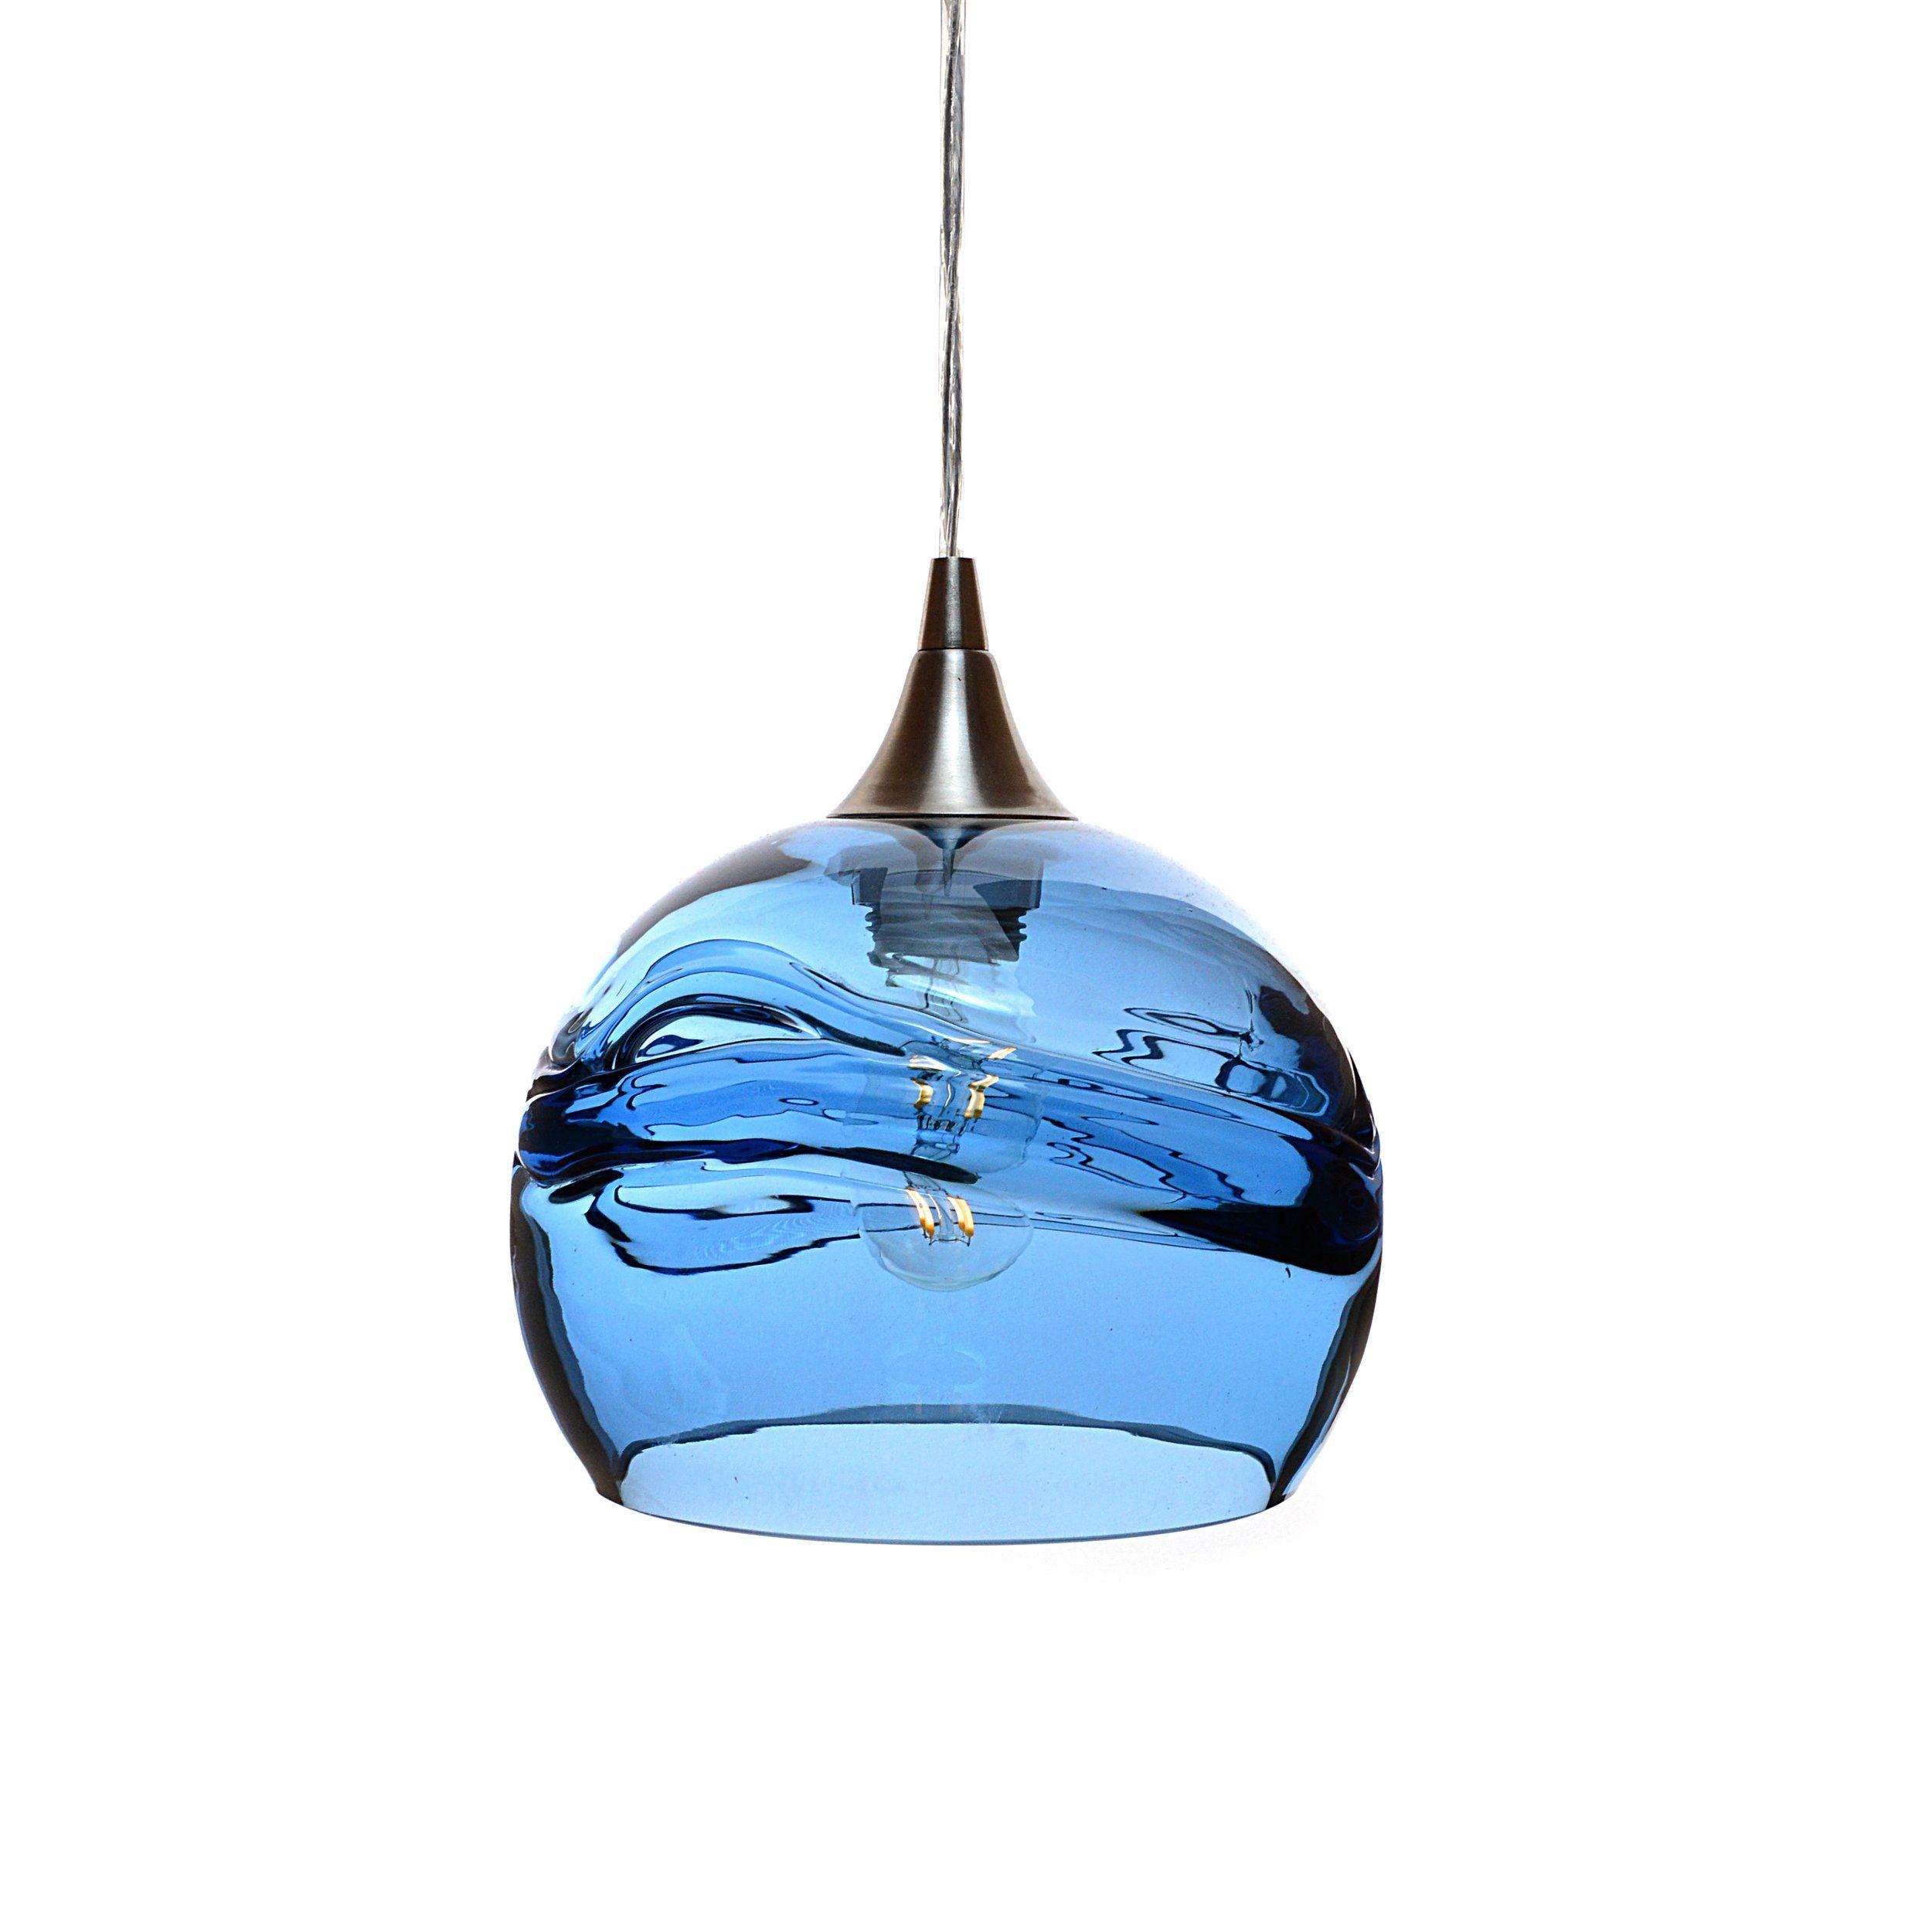 767 Swell Single Pendant Light Single Pendant Lighting Blown Glass Pendant Light Pendant Light